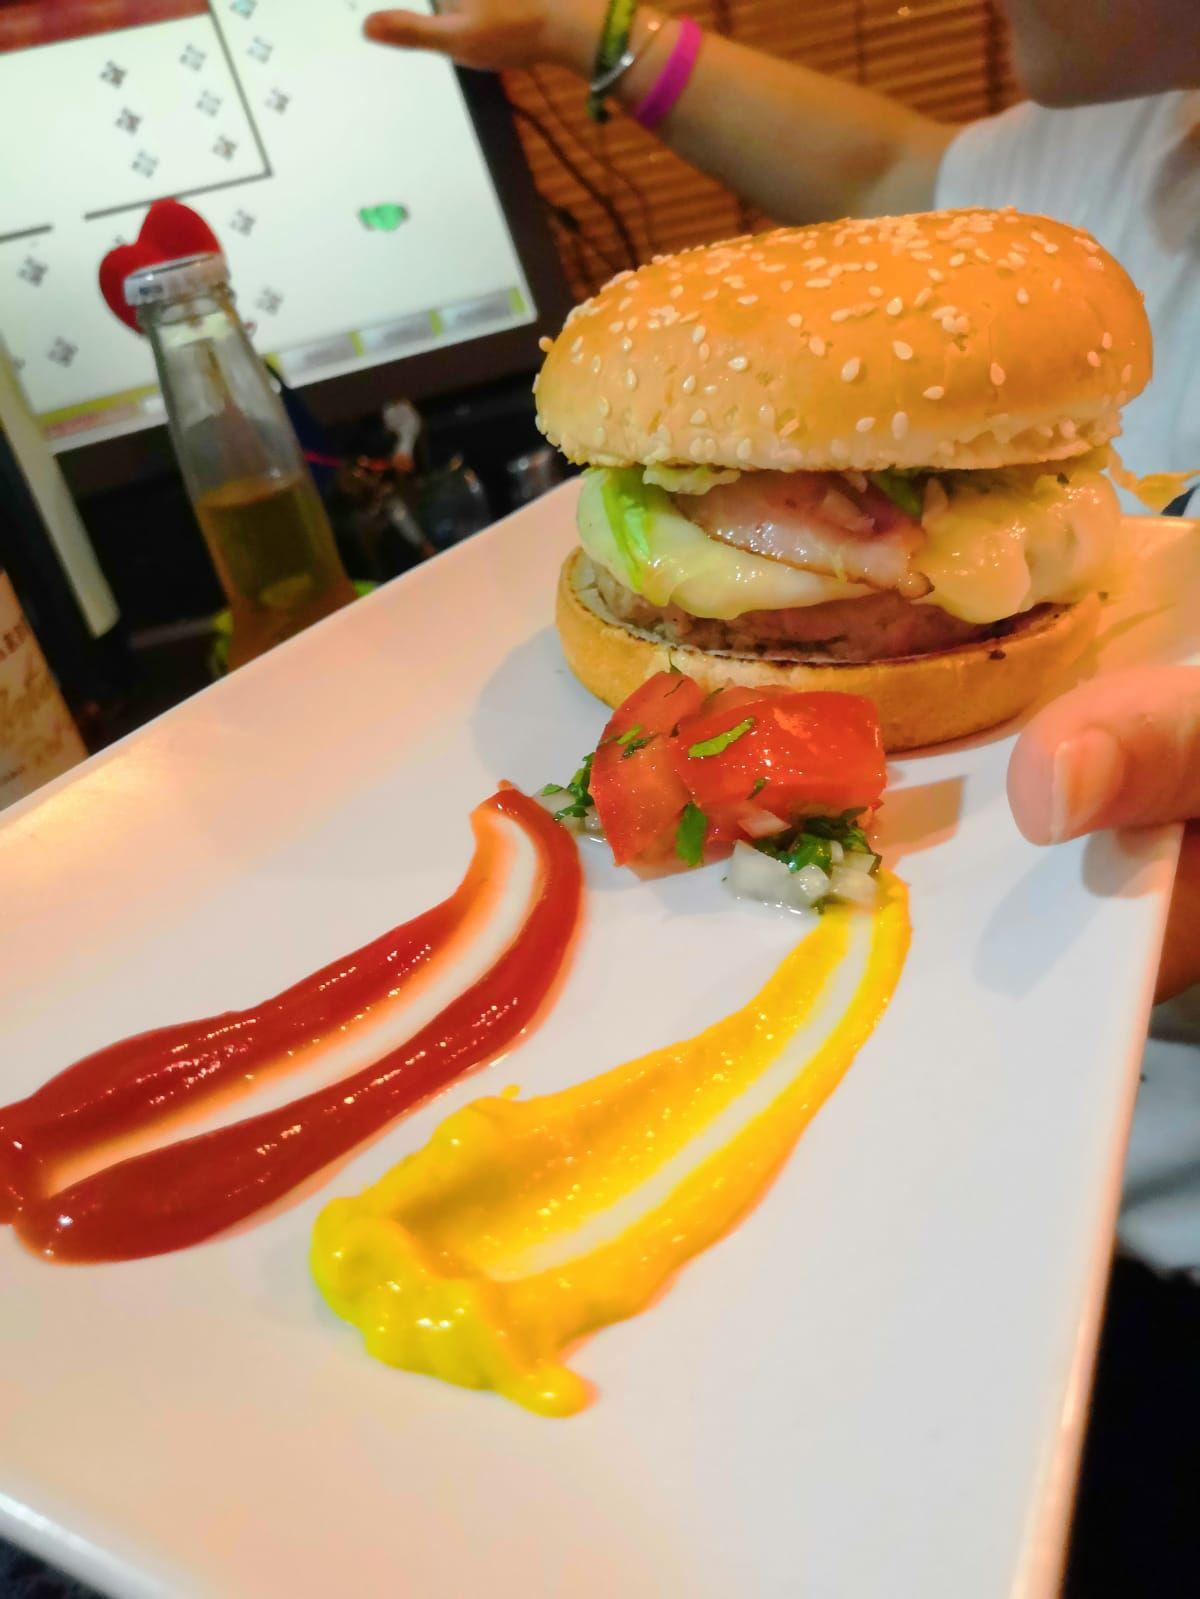 Foto 46 de Restaurante mexicano en  | Cantina La Catrina